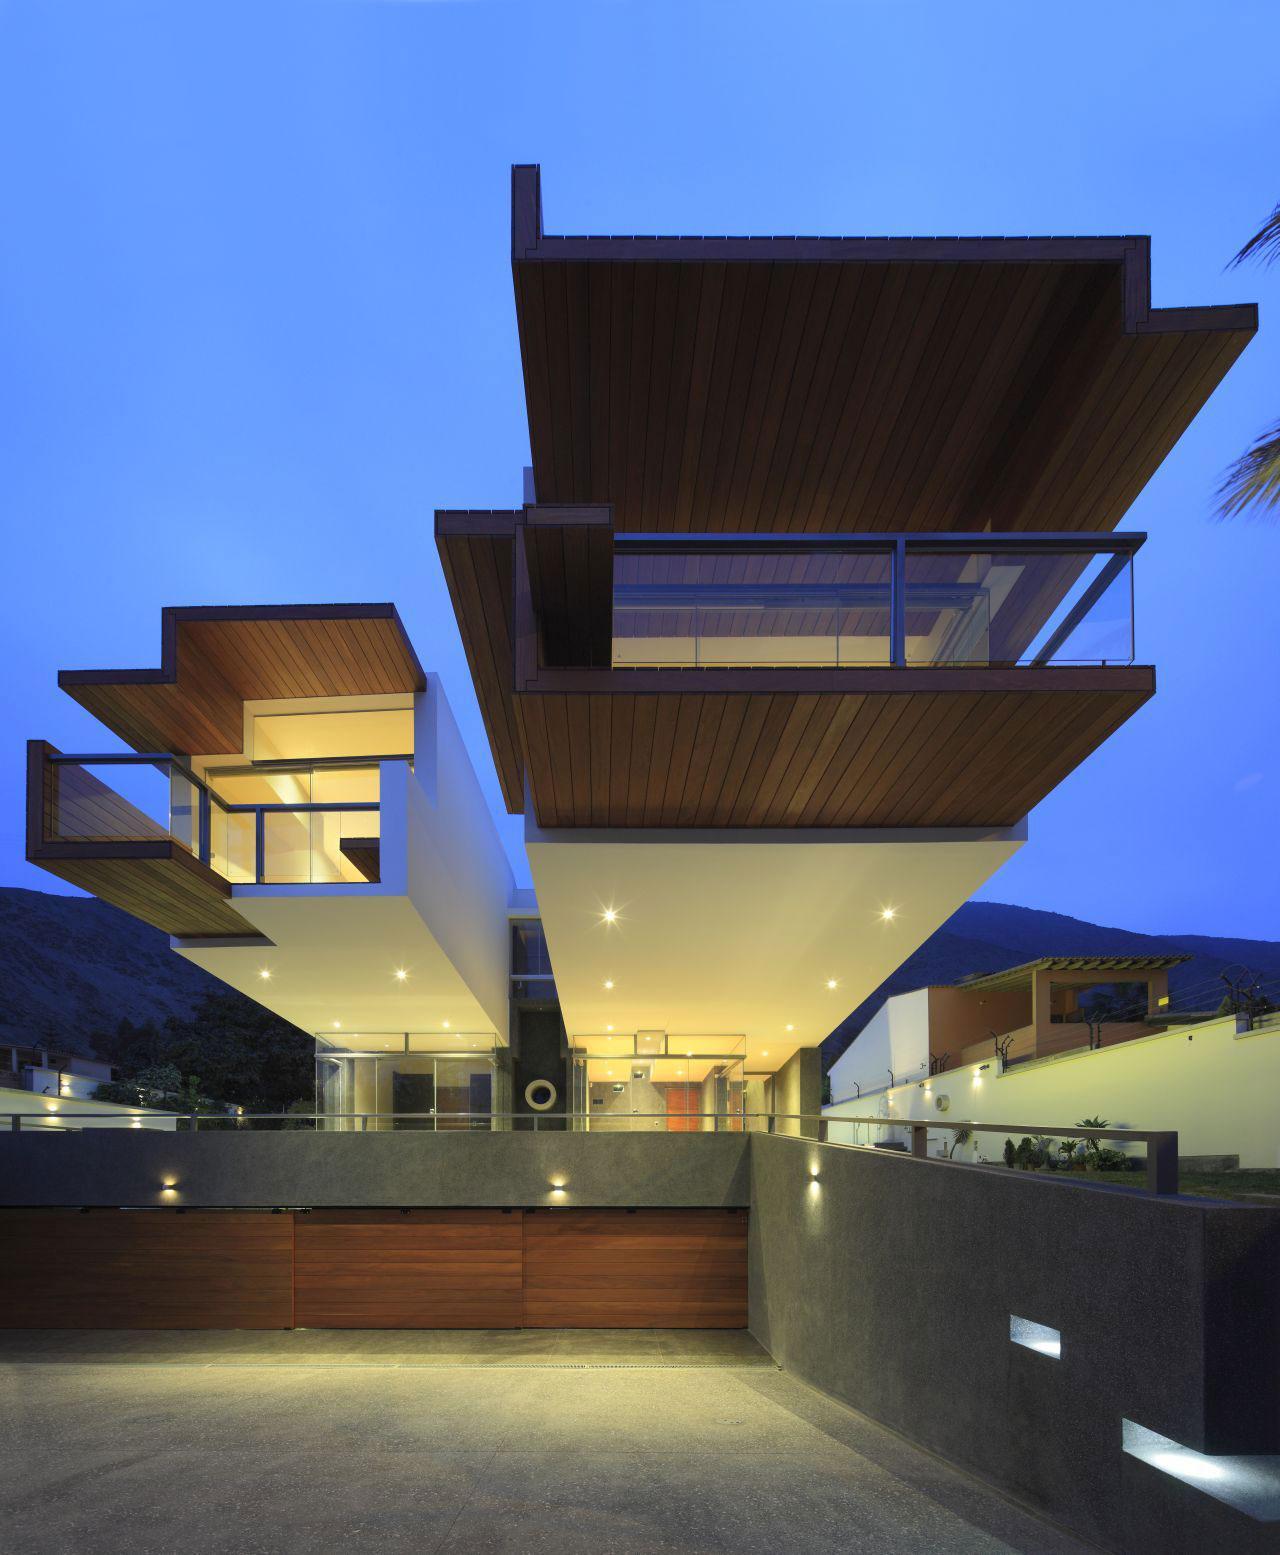 Outdoor Lighting, Garages, Home in La Planicie, Lima